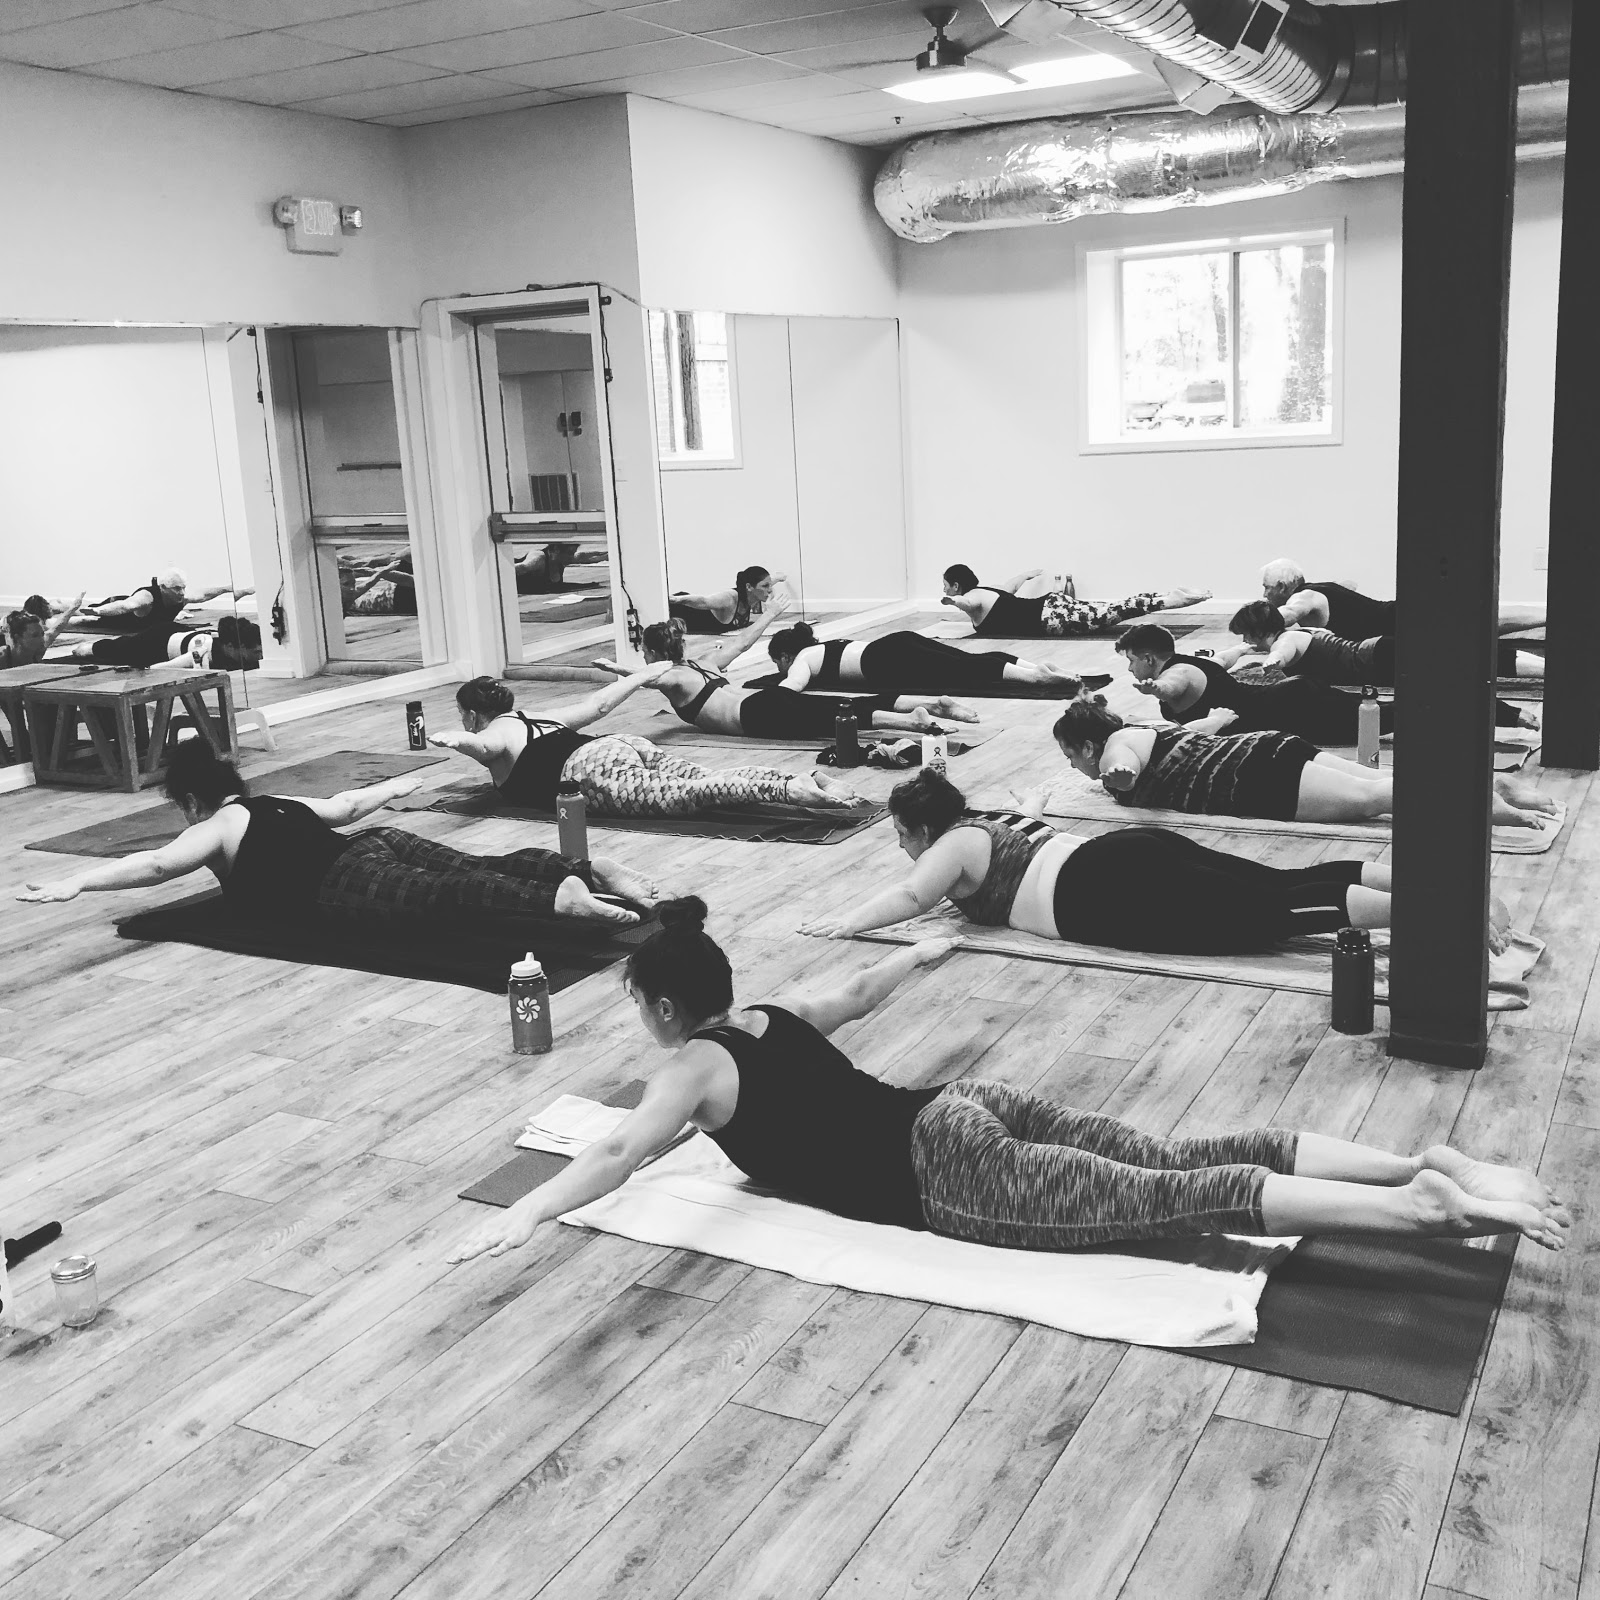 Pilates Studios In Exeter Nh Mindbody